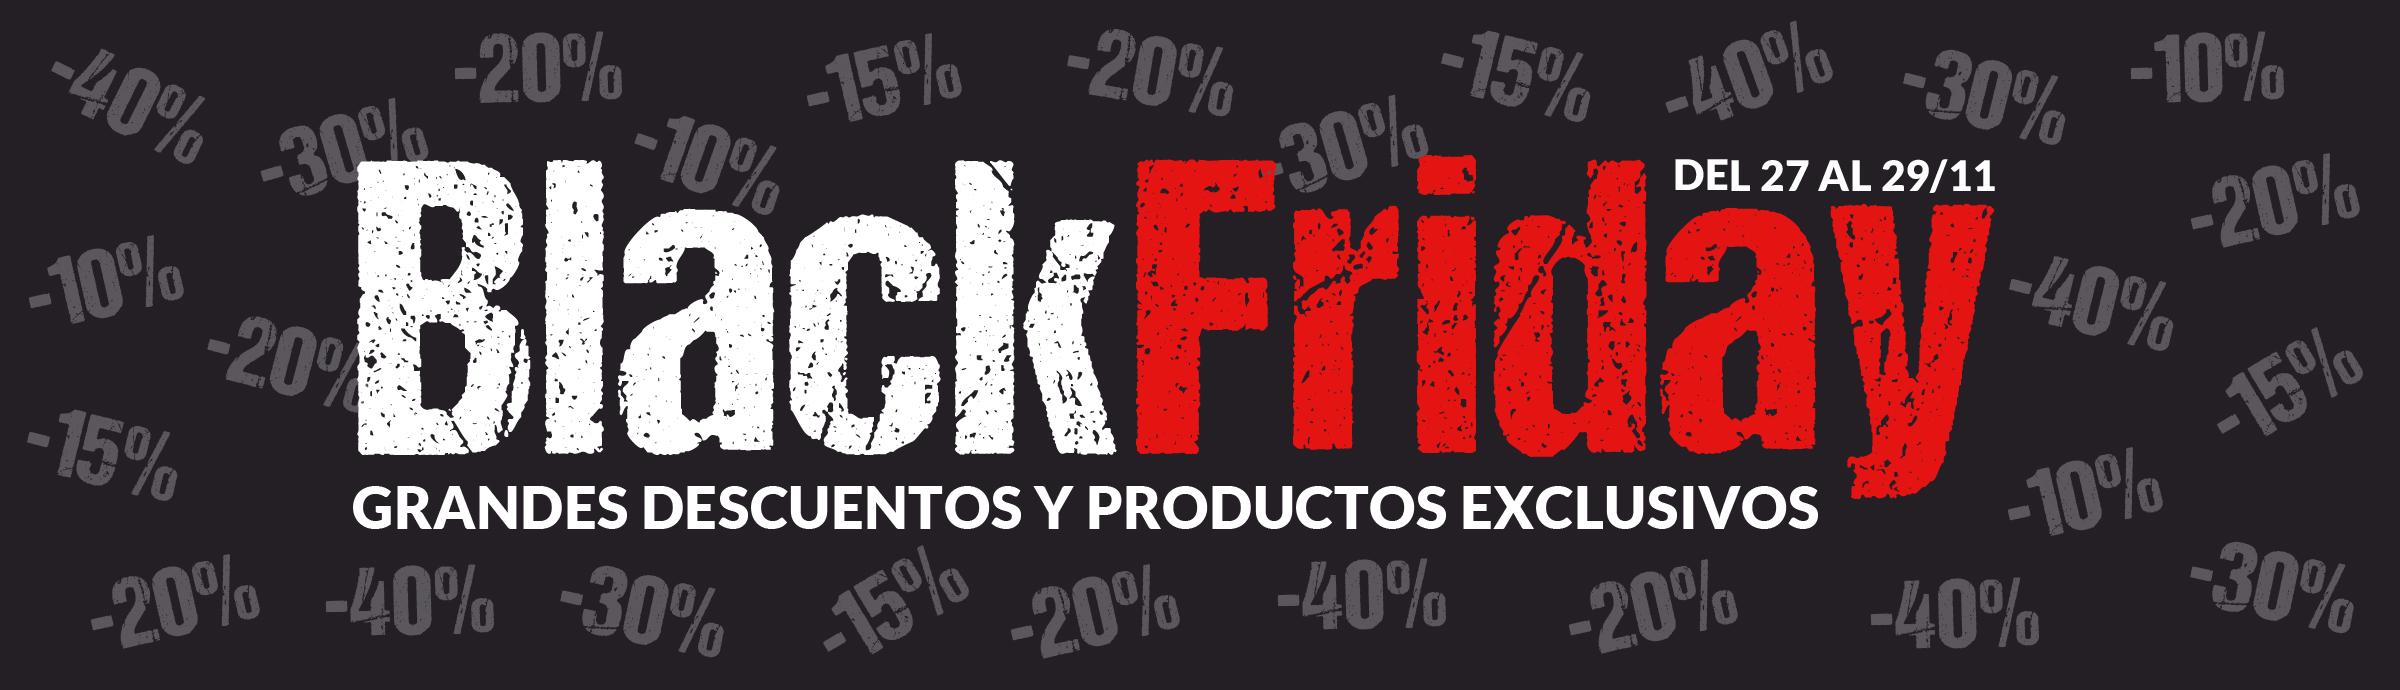 Black Friday Beyblade 2020